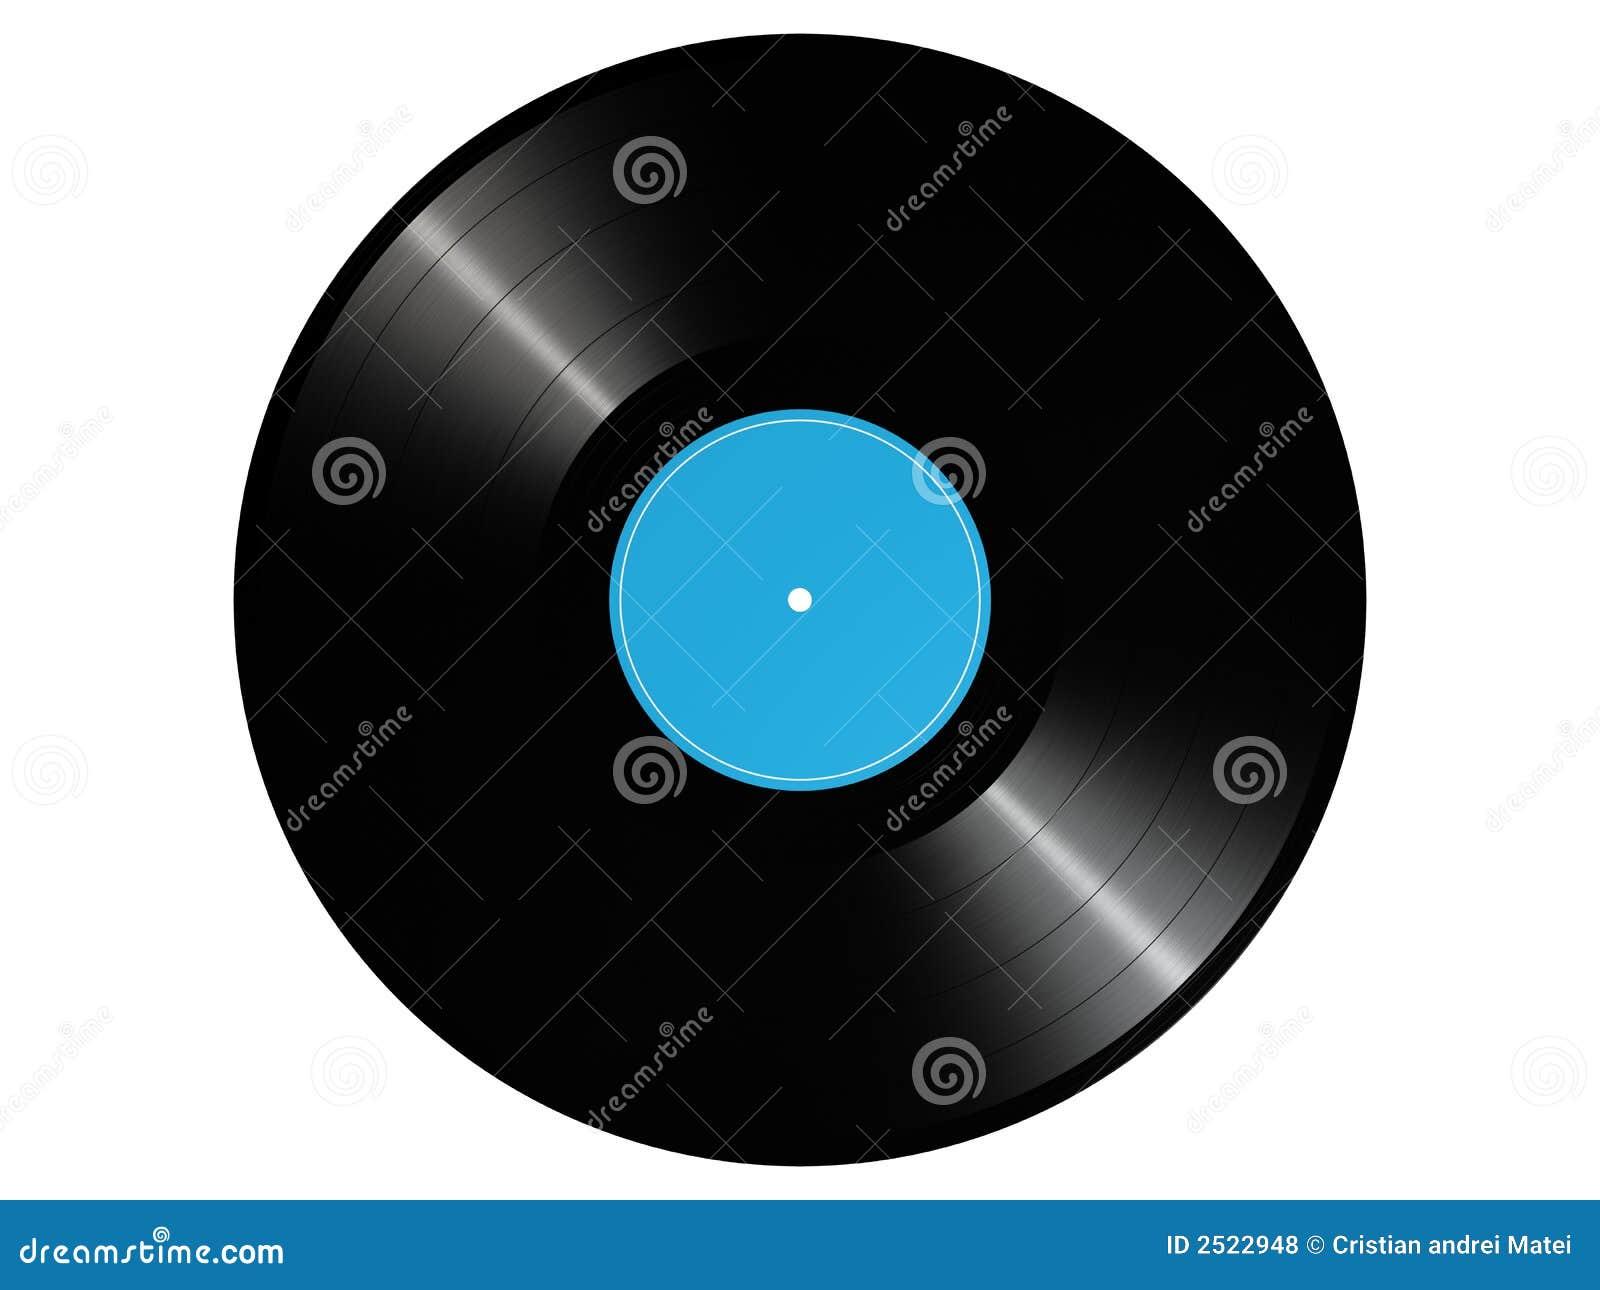 Vinyl Record Royalty Free Stock Photos Image 2522948